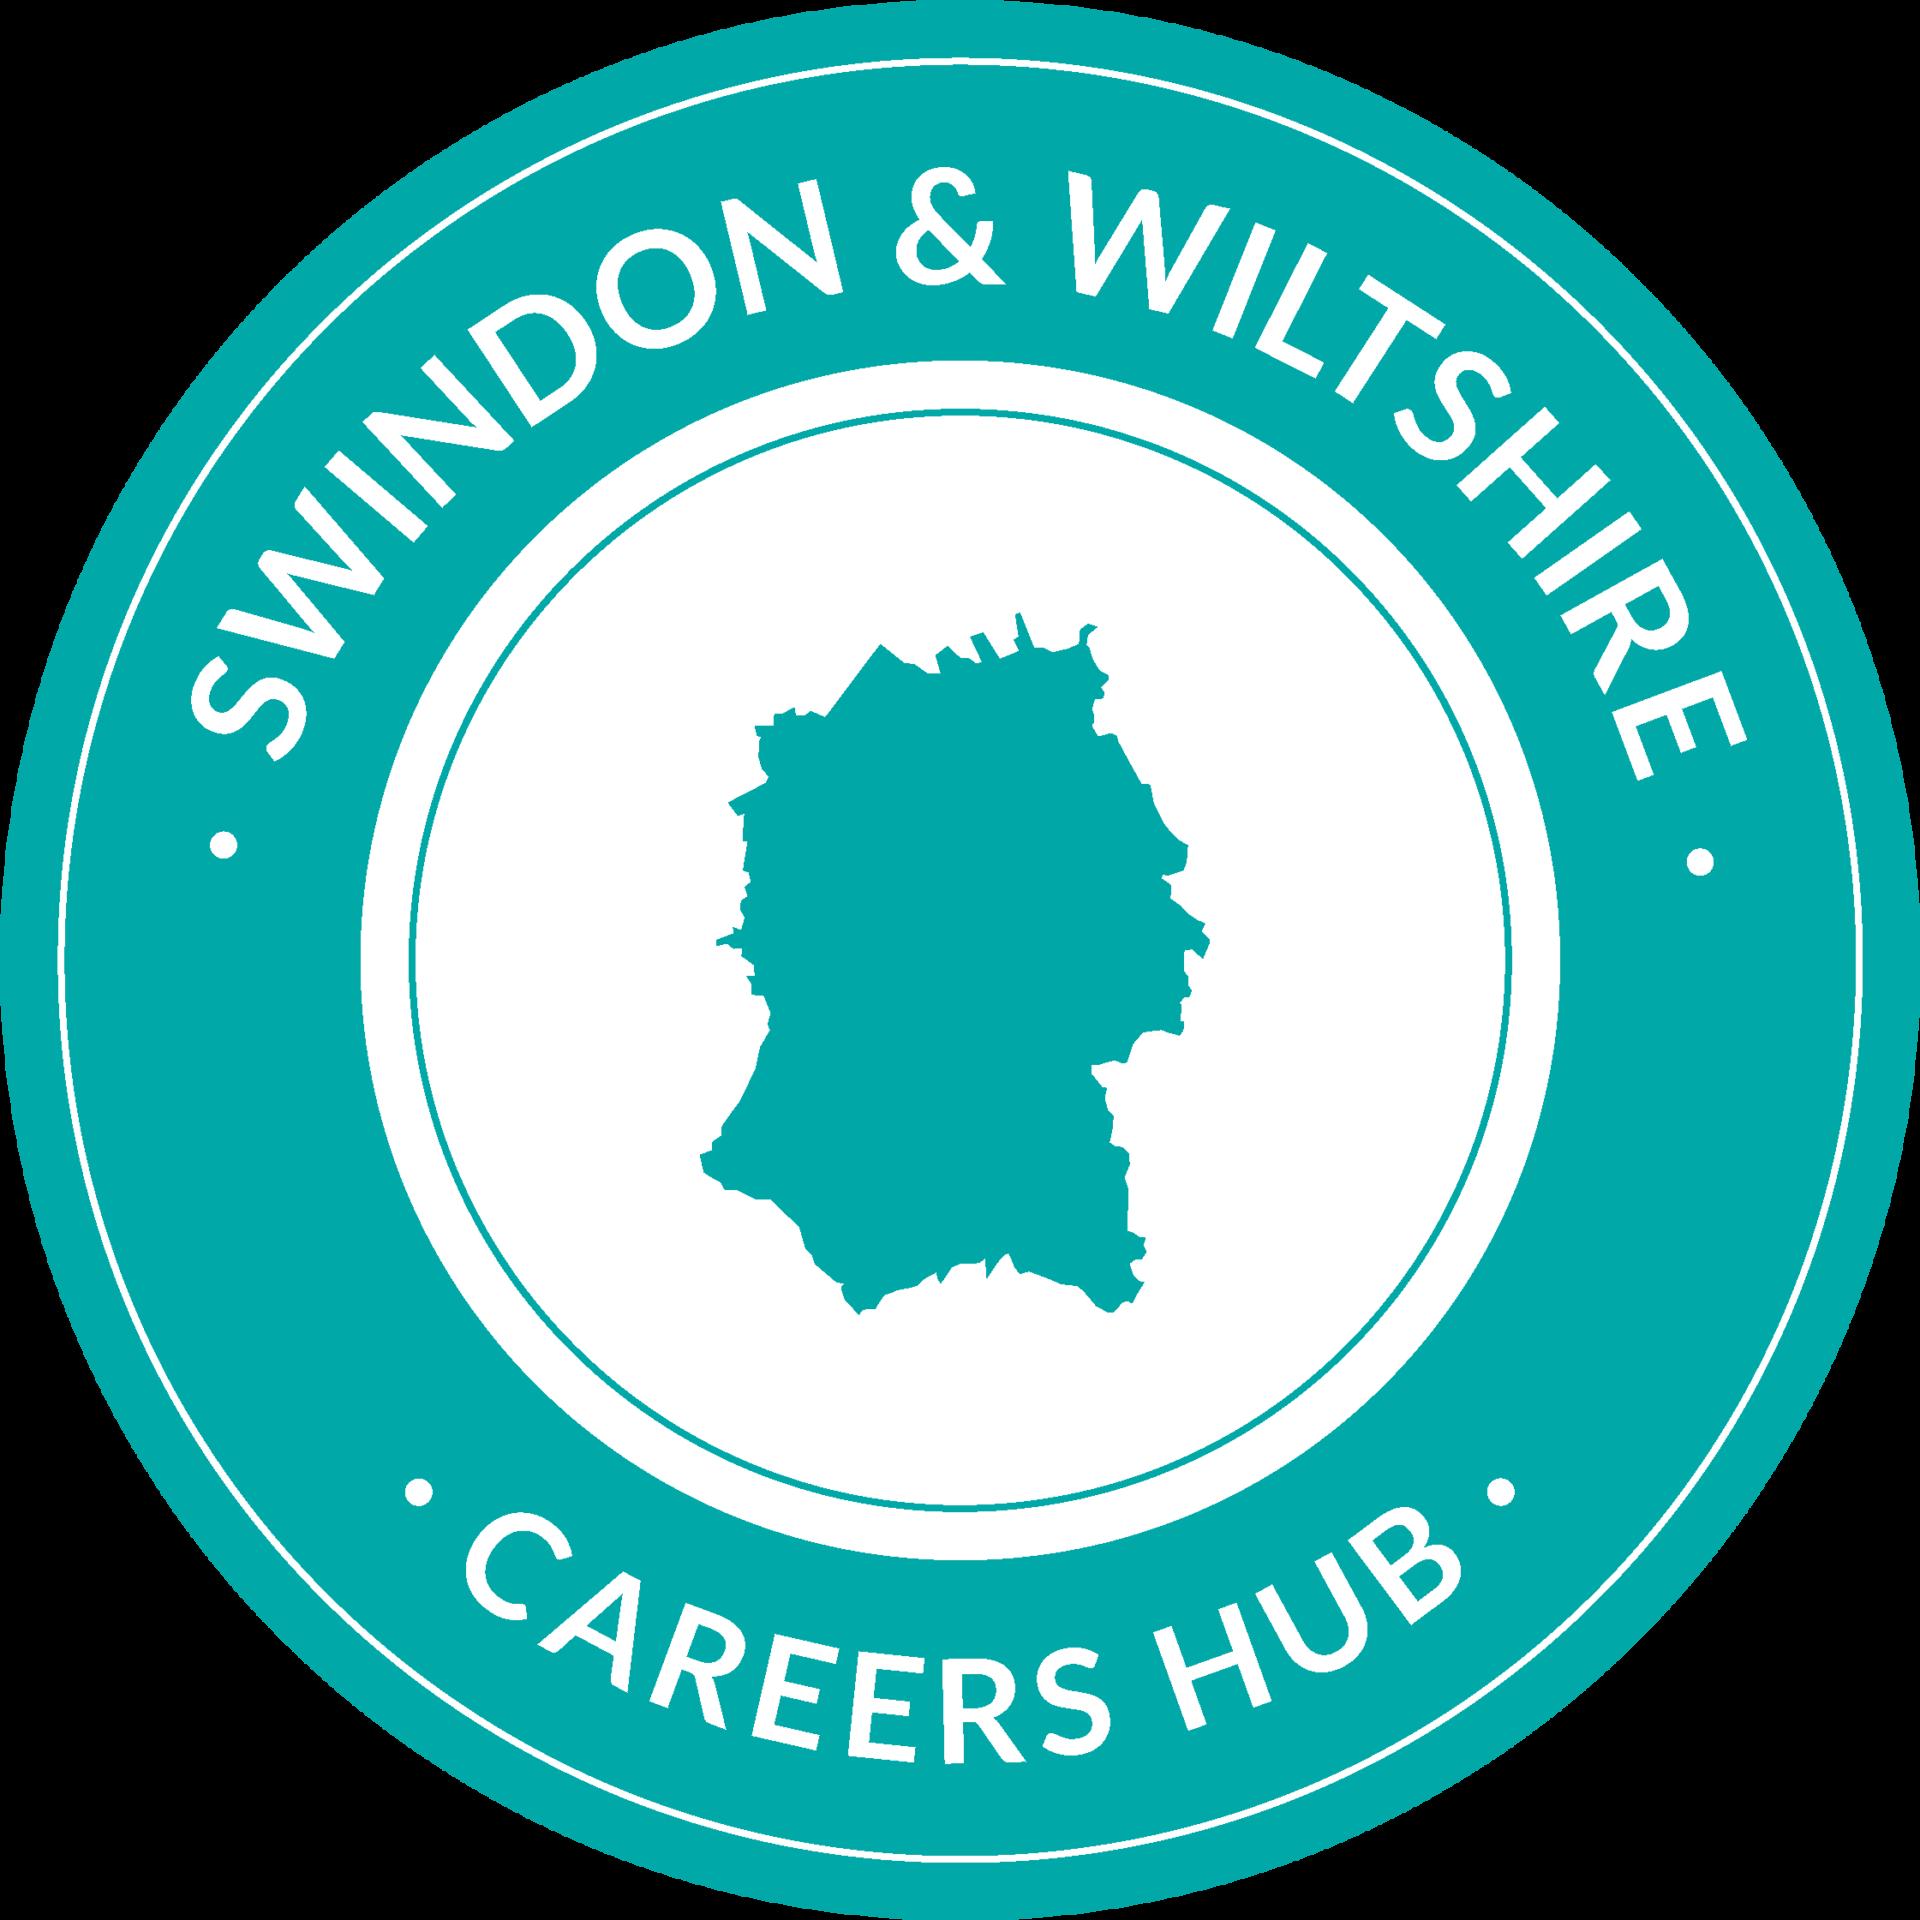 Swindon and Wiltshire Careers Hub Logo